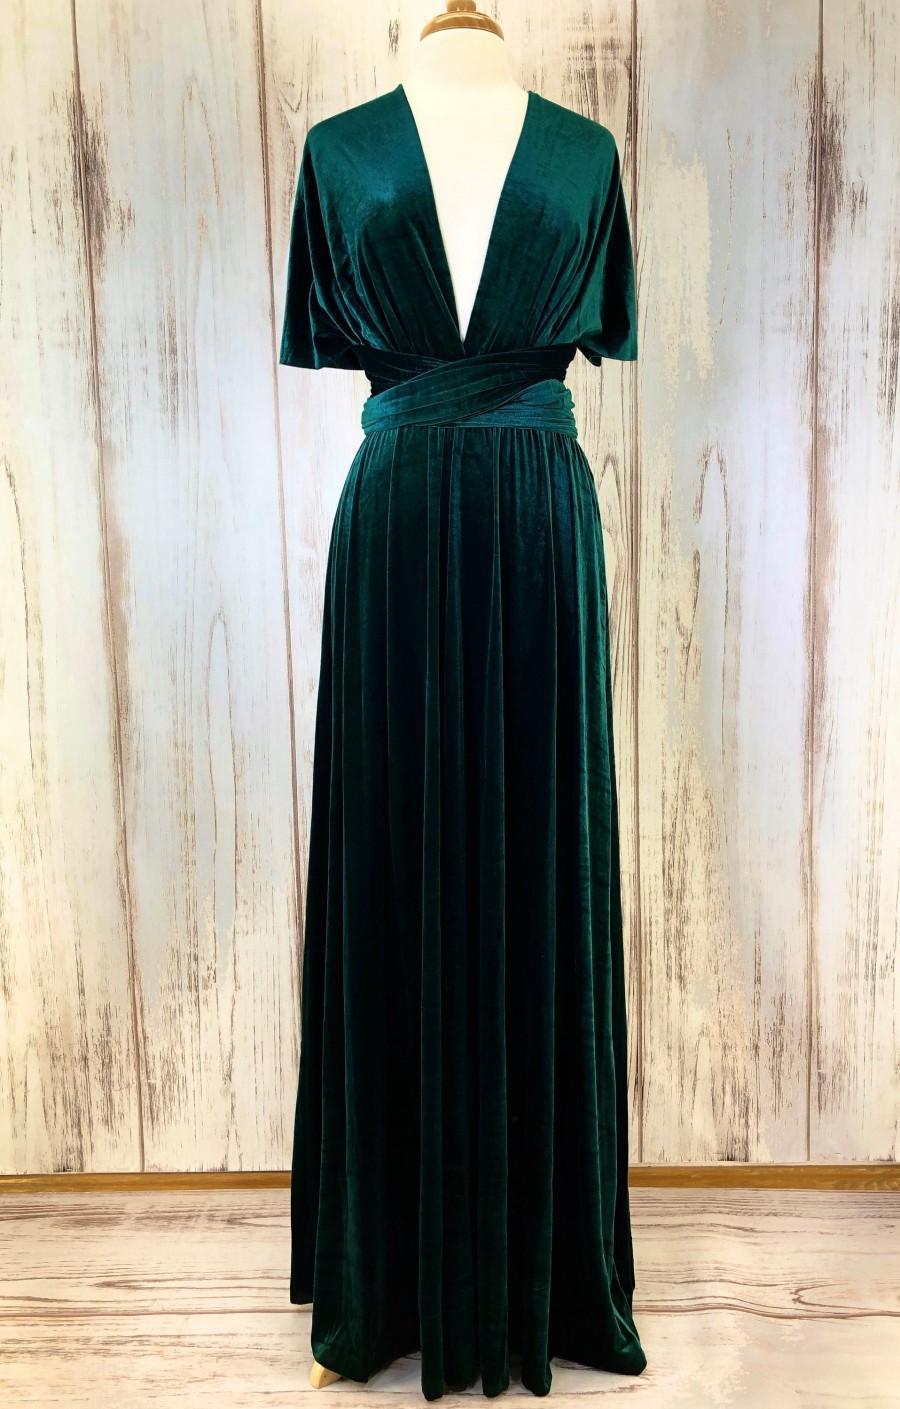 Mariage - EMERALD VELVET Infinity Dress/ Bridesmaids Dress/ Convertible Dress / Multiway Dress/ Multiway Wrap Dress / Velvet Bridesmaids Dress